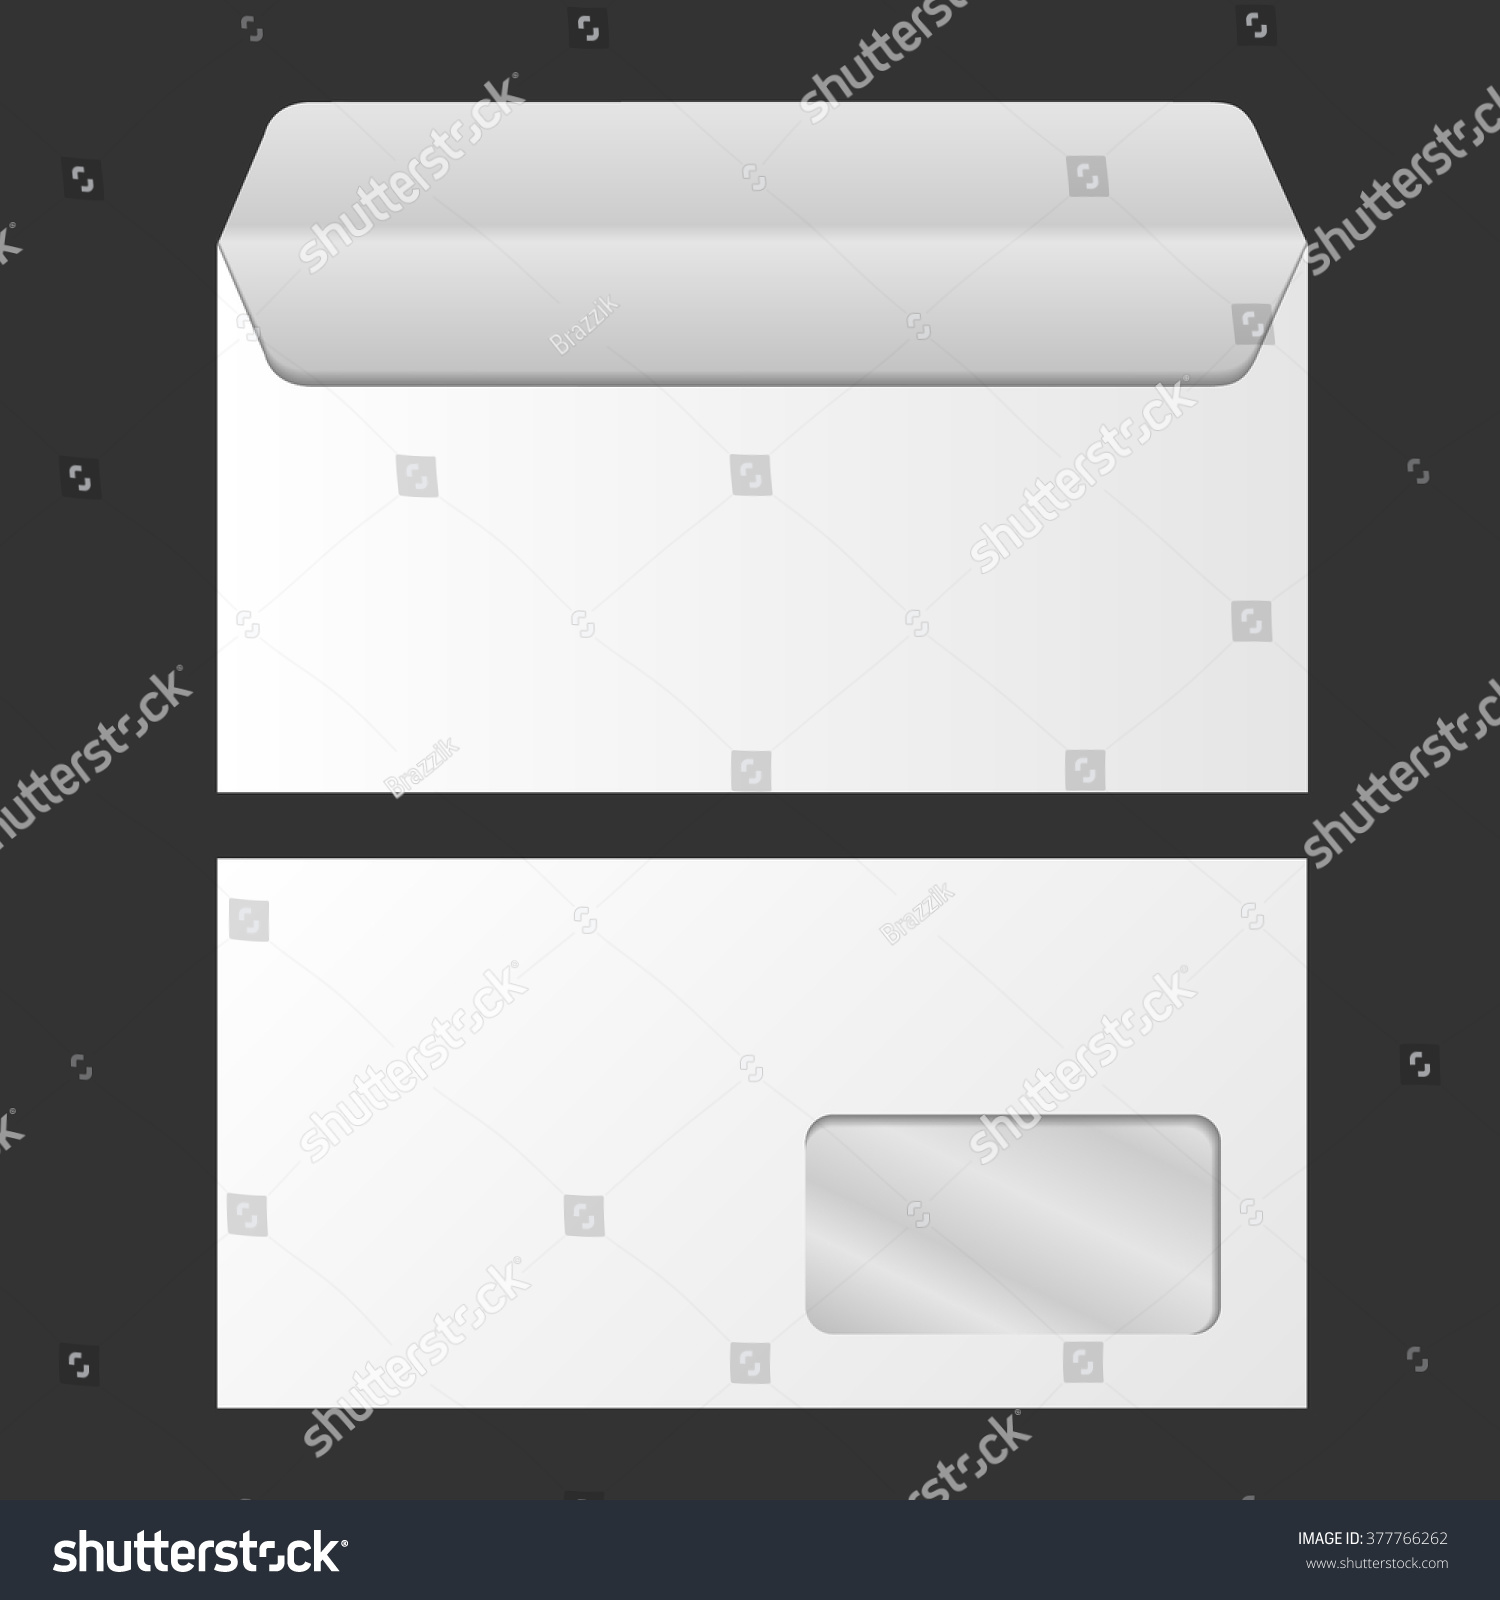 Template Advertising Corporate Identity Envelope Window Stock Vector